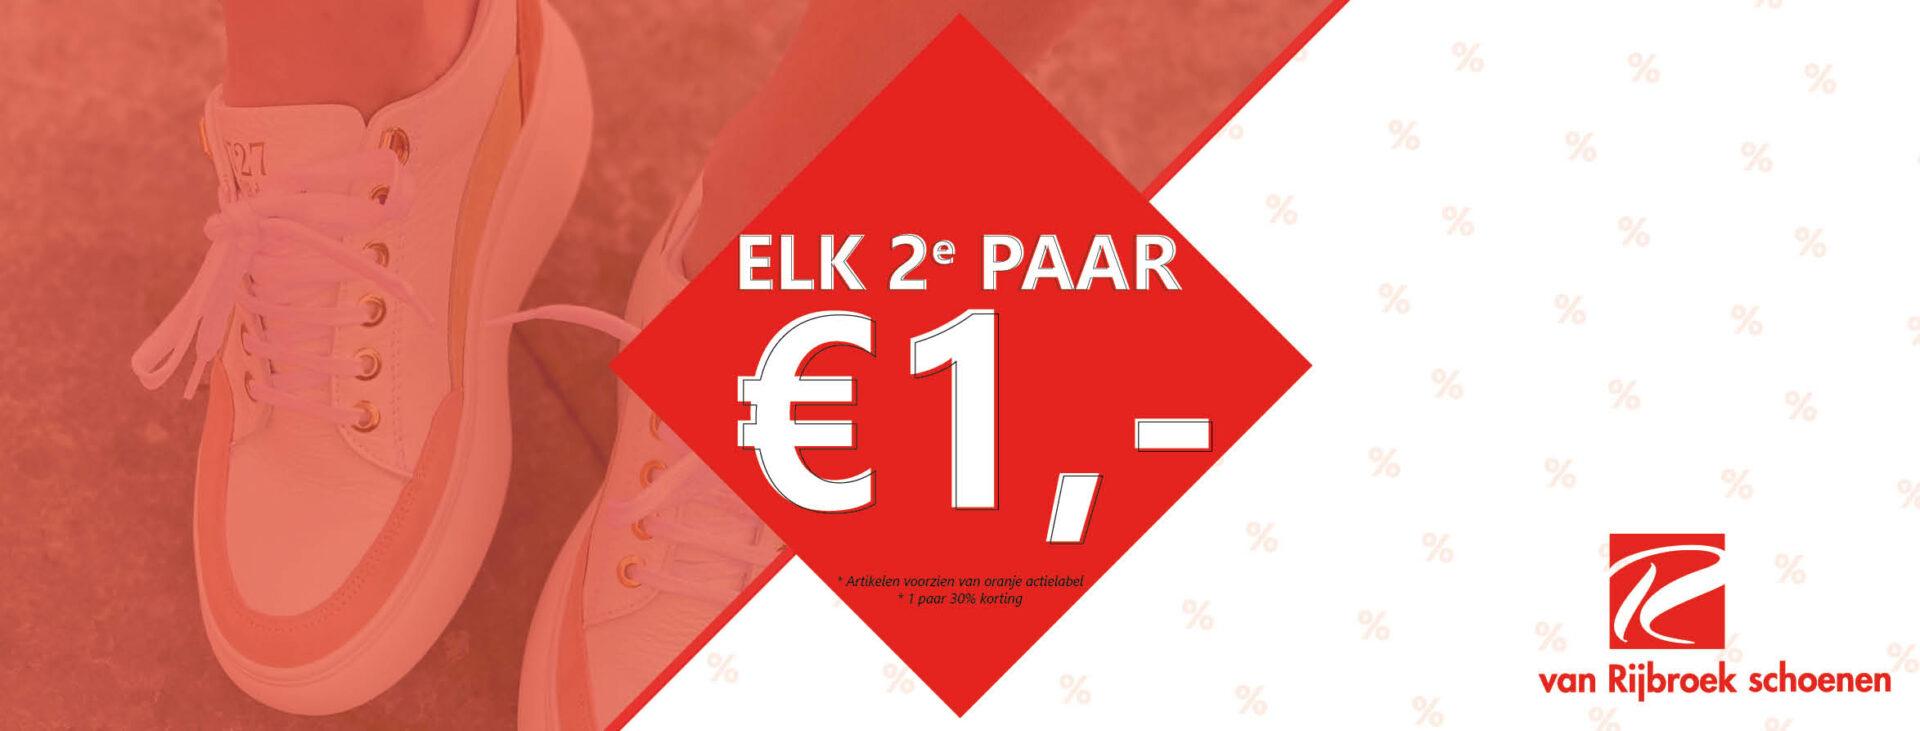 elk 2e paar 1 euro